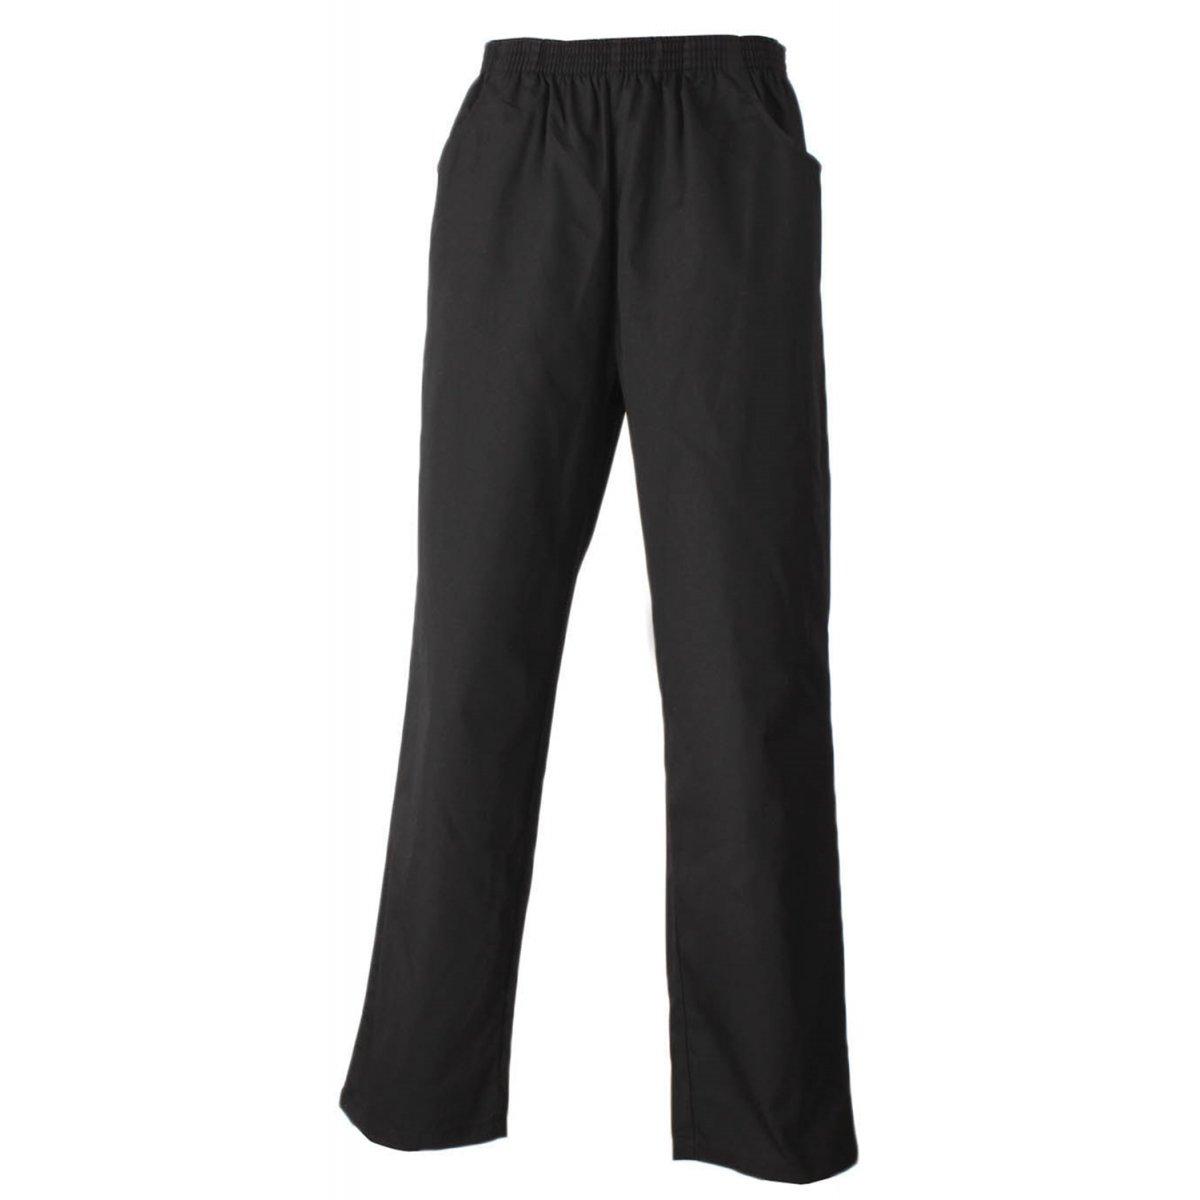 MISEMIYA Pantalones de Trabajo Unisex Adulto